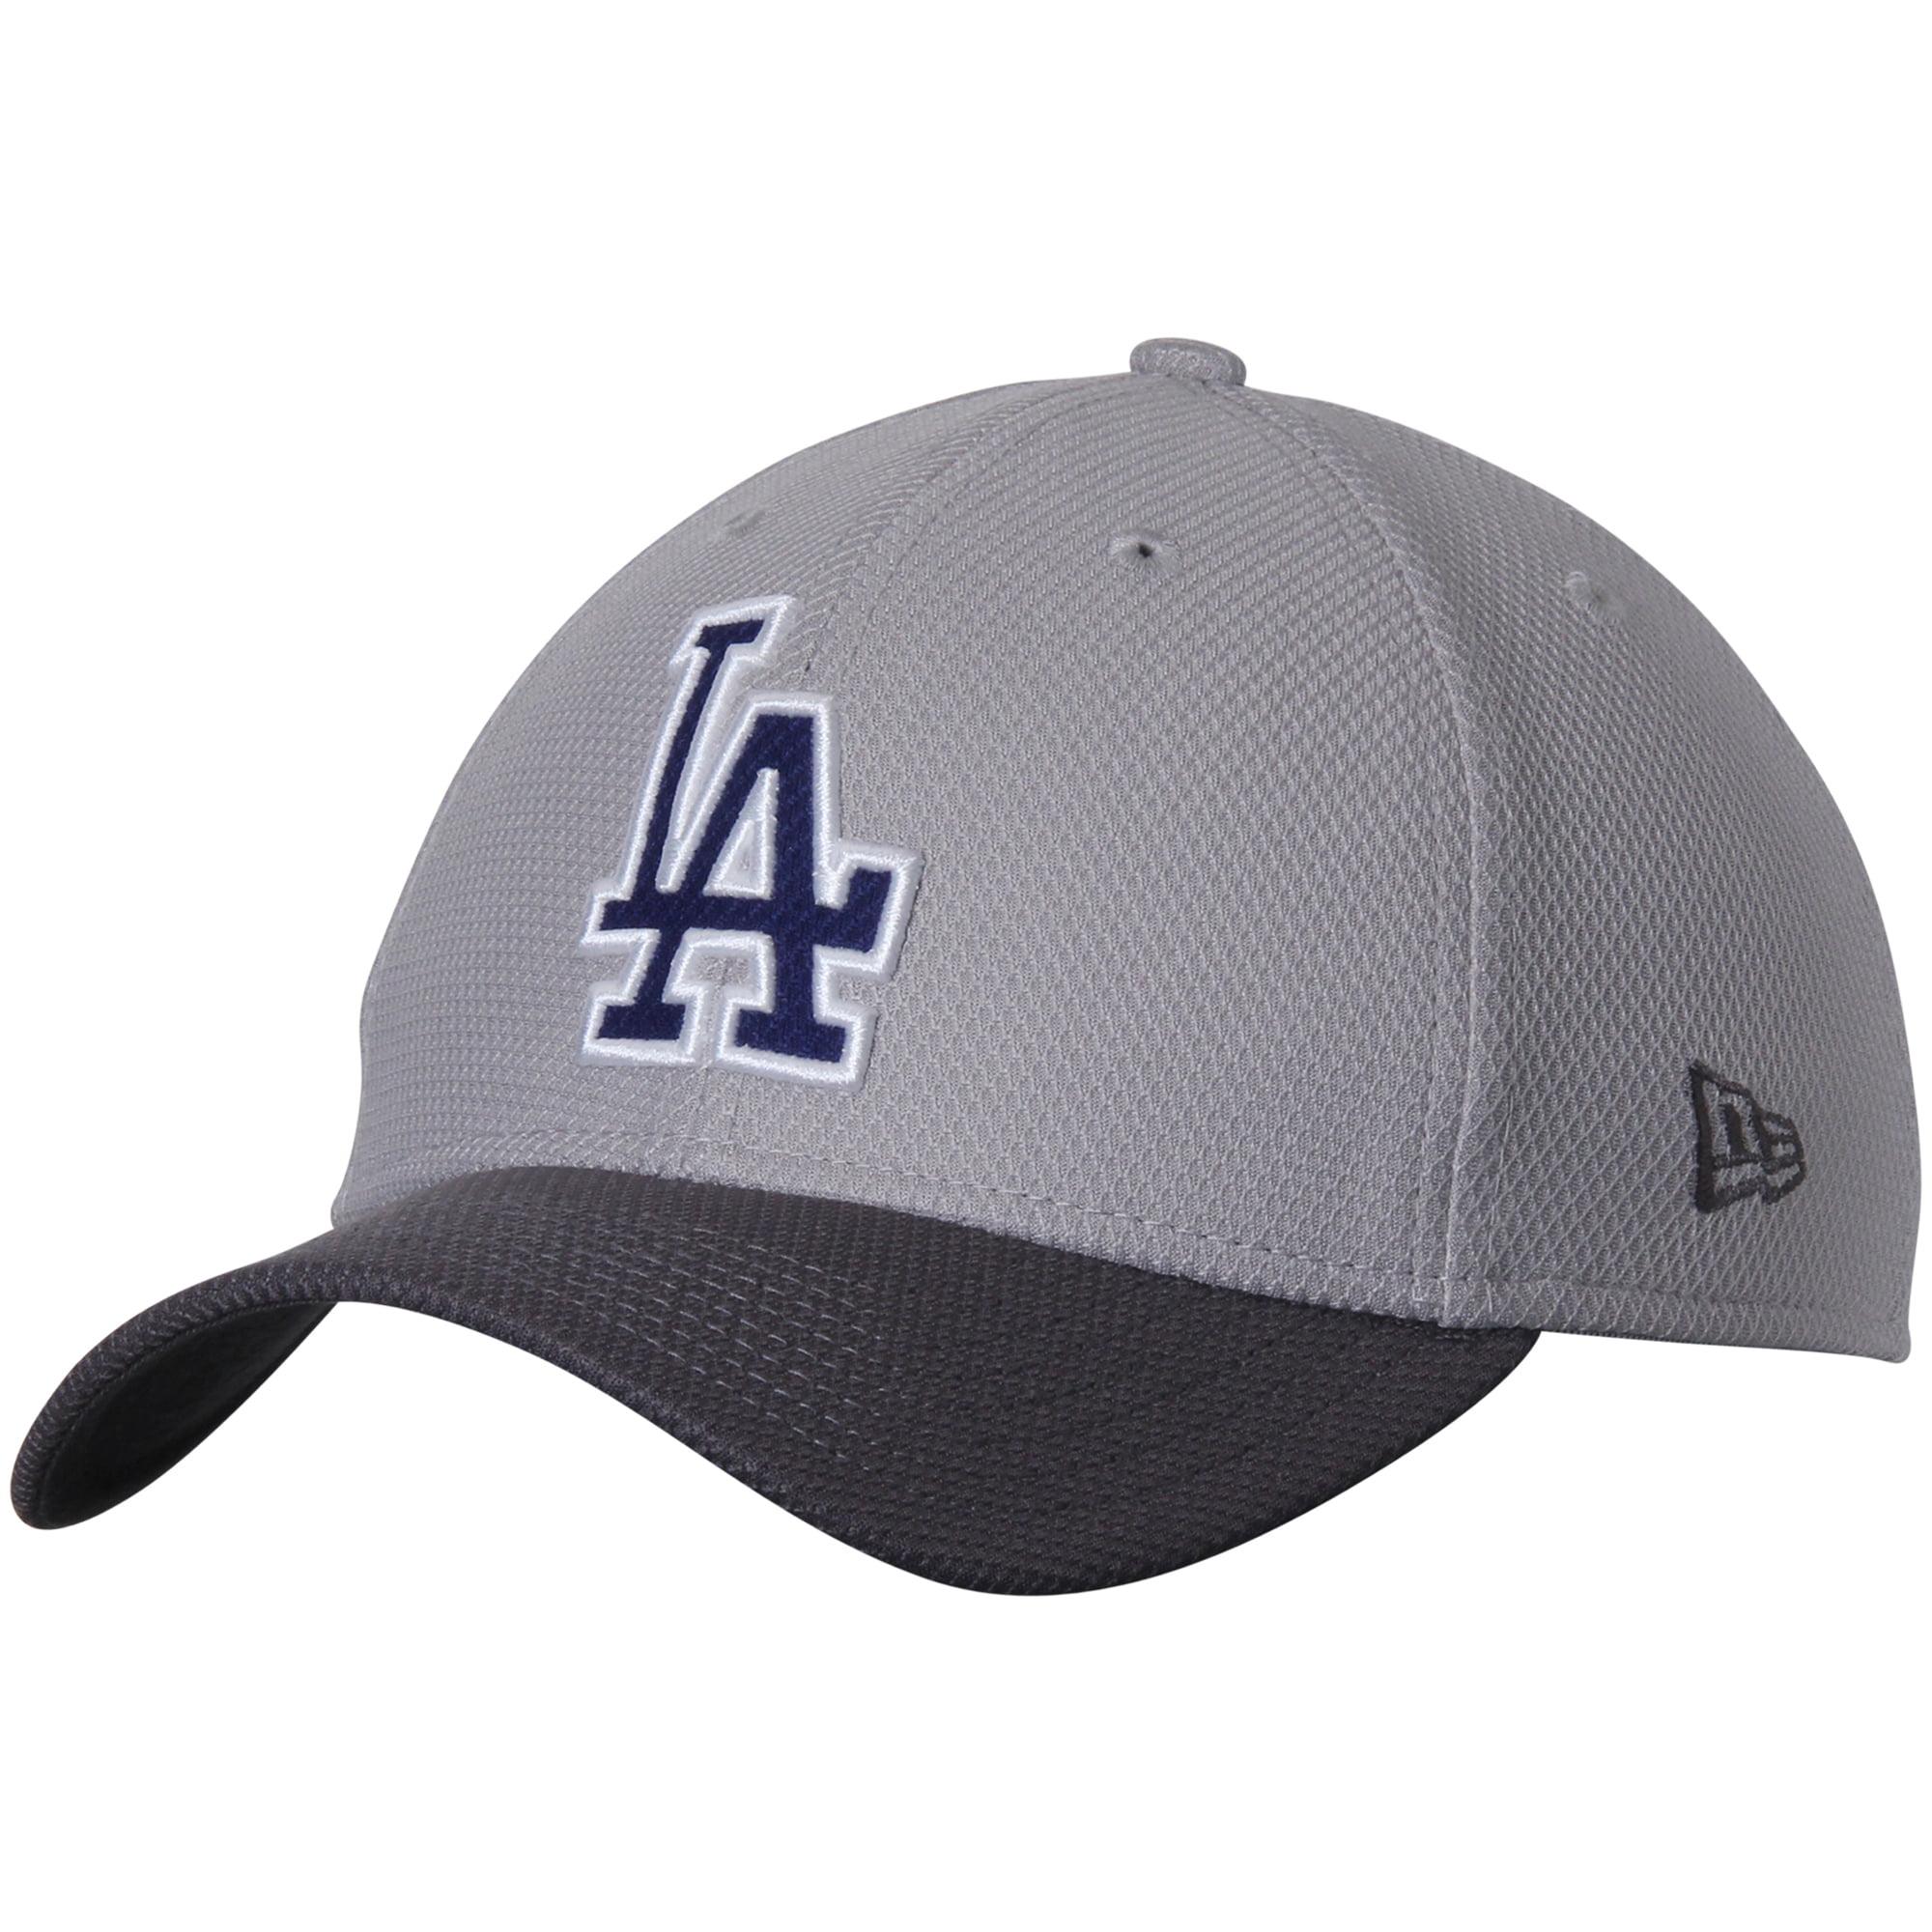 Los Angeles Dodgers New Era Team Grayed 39THIRTY Flex Hat - Gray/Graphite